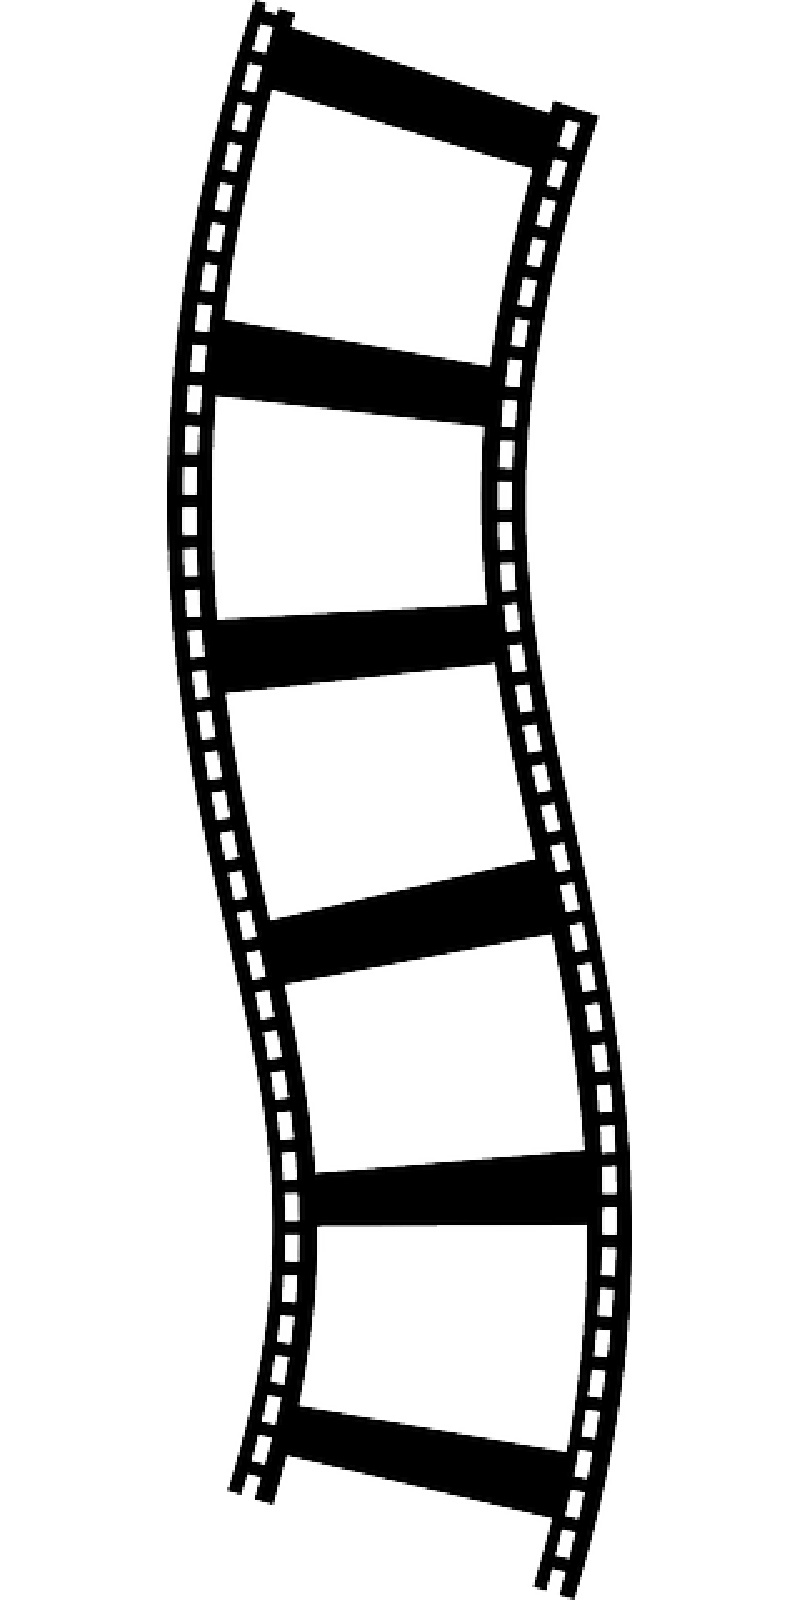 800x1600 Movie Reel Film Border Clipart Image